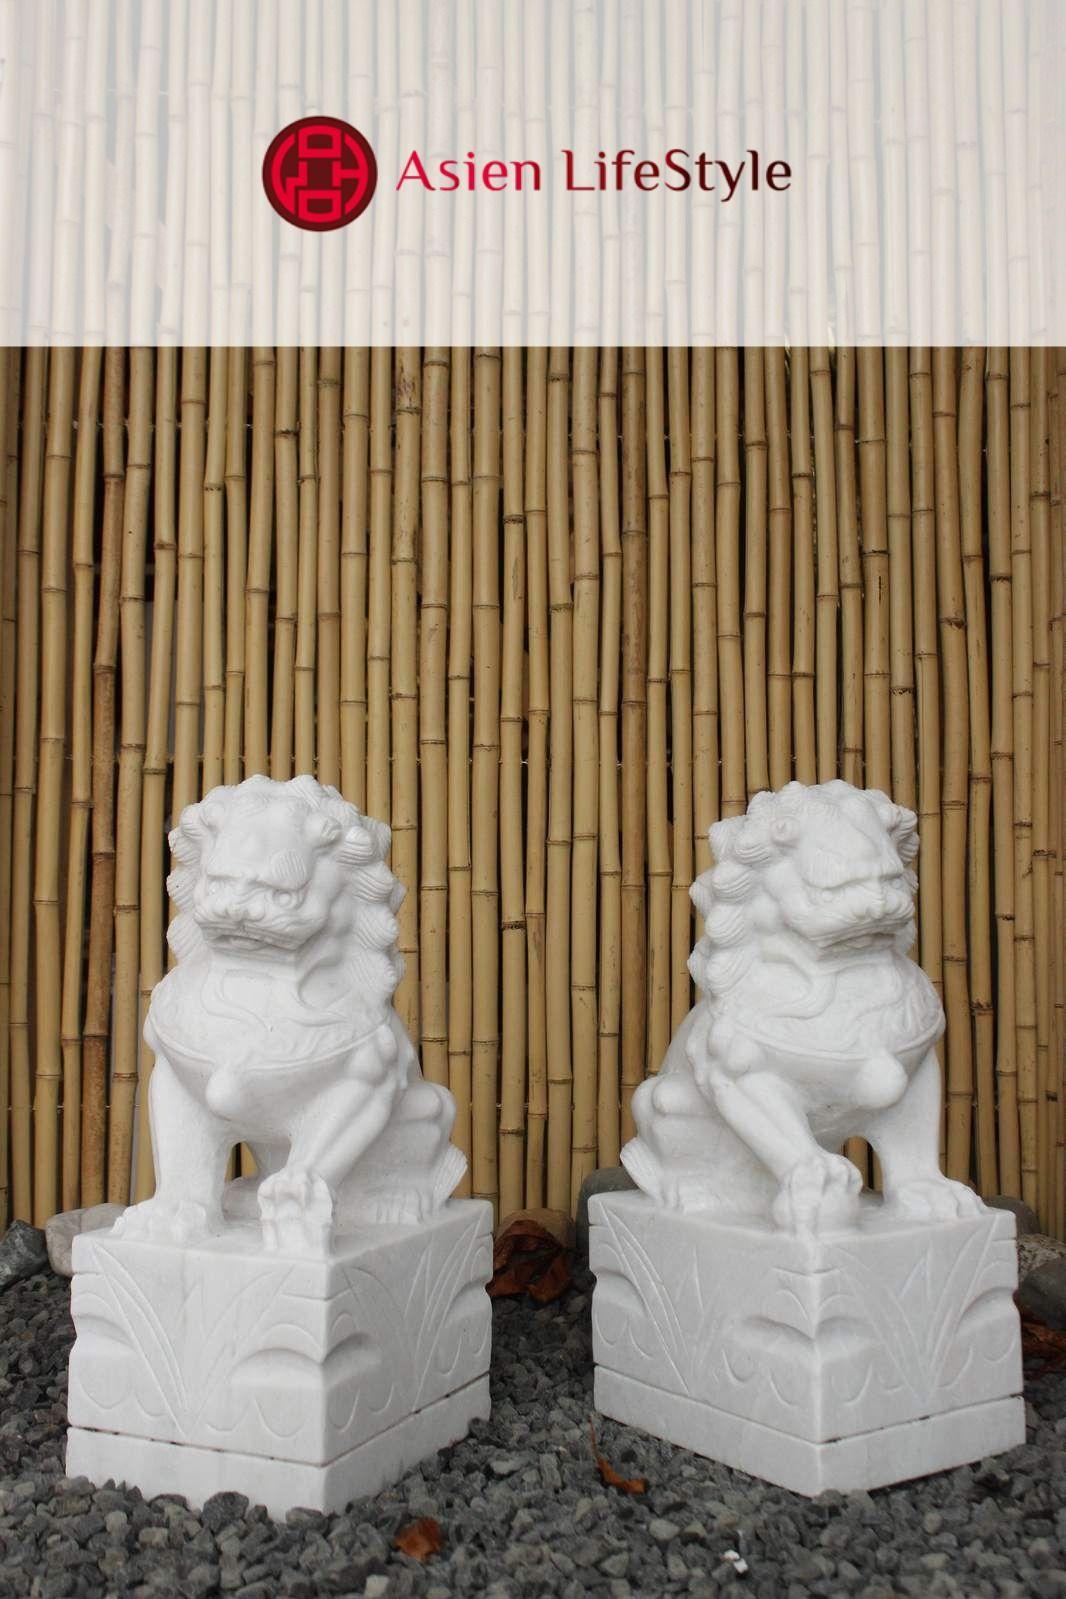 Marmor Fu Dog Wachterlowen Garten Deko Figuren Garten Deko Chinesischer Garten Bonsai Pflanzen